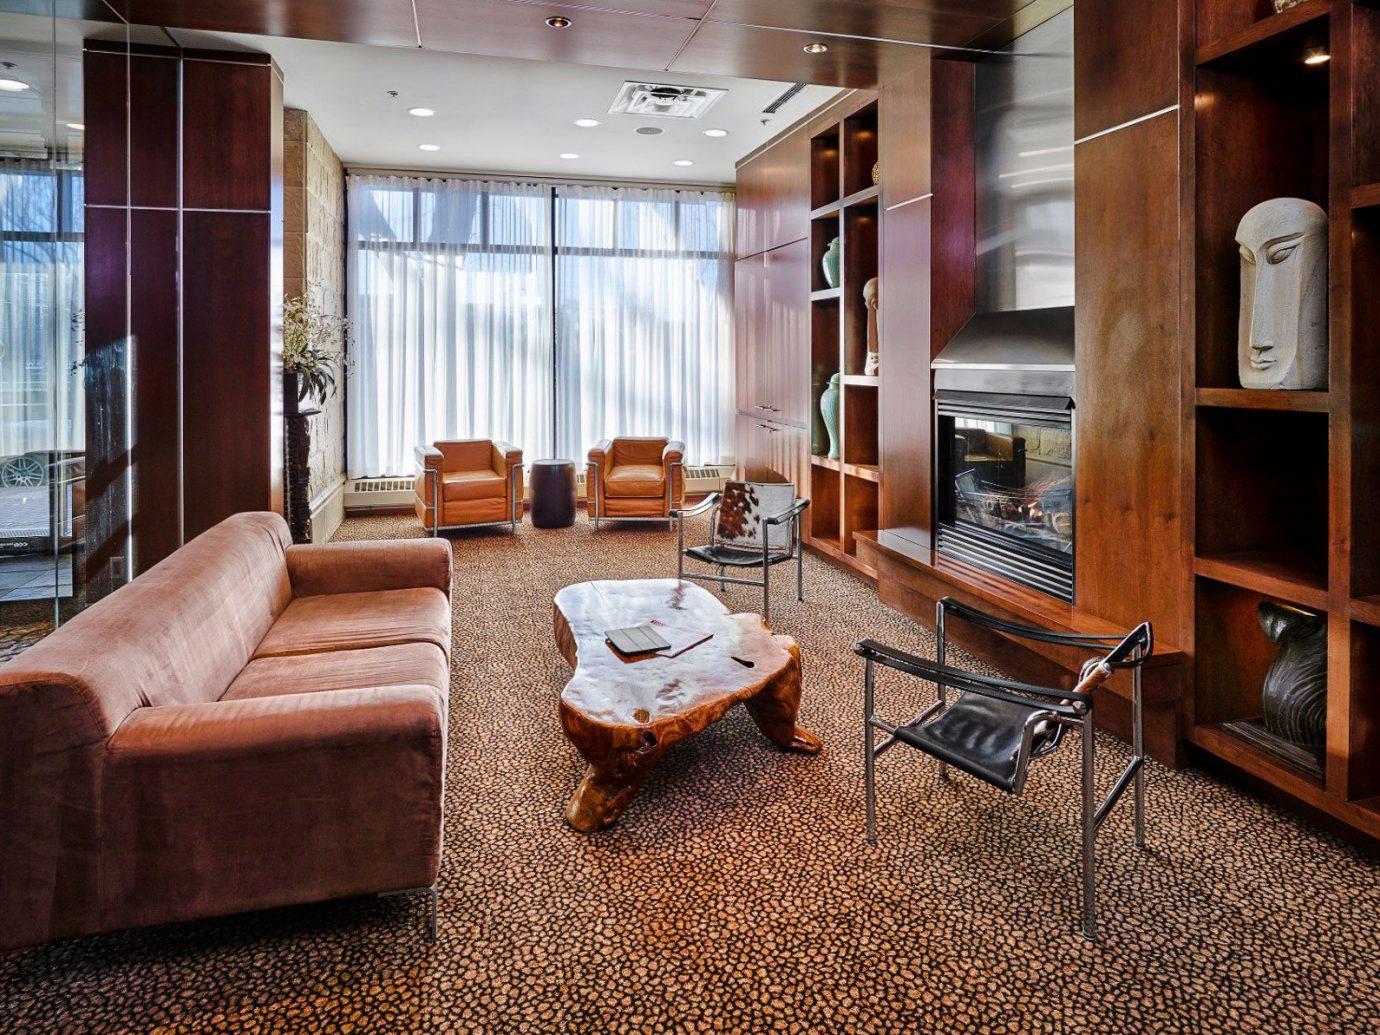 Alberta Canada Road Trips floor indoor room window interior design living room flooring Suite real estate furniture Lobby